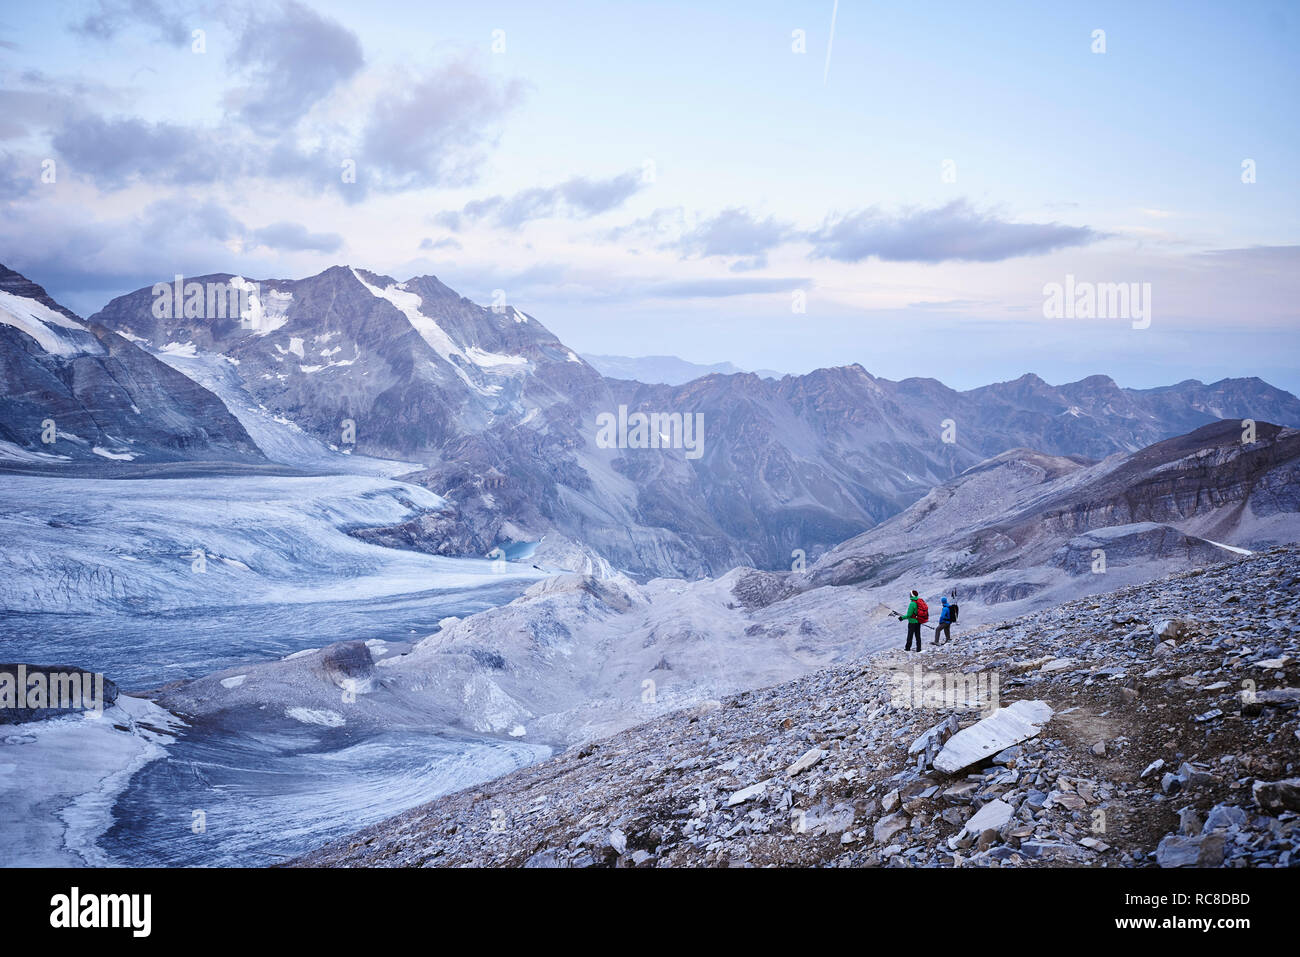 Wanderer Freunde Blick auf Gletscher, Mont Cervin, Matterhorn, Wallis, Schweiz Stockfoto